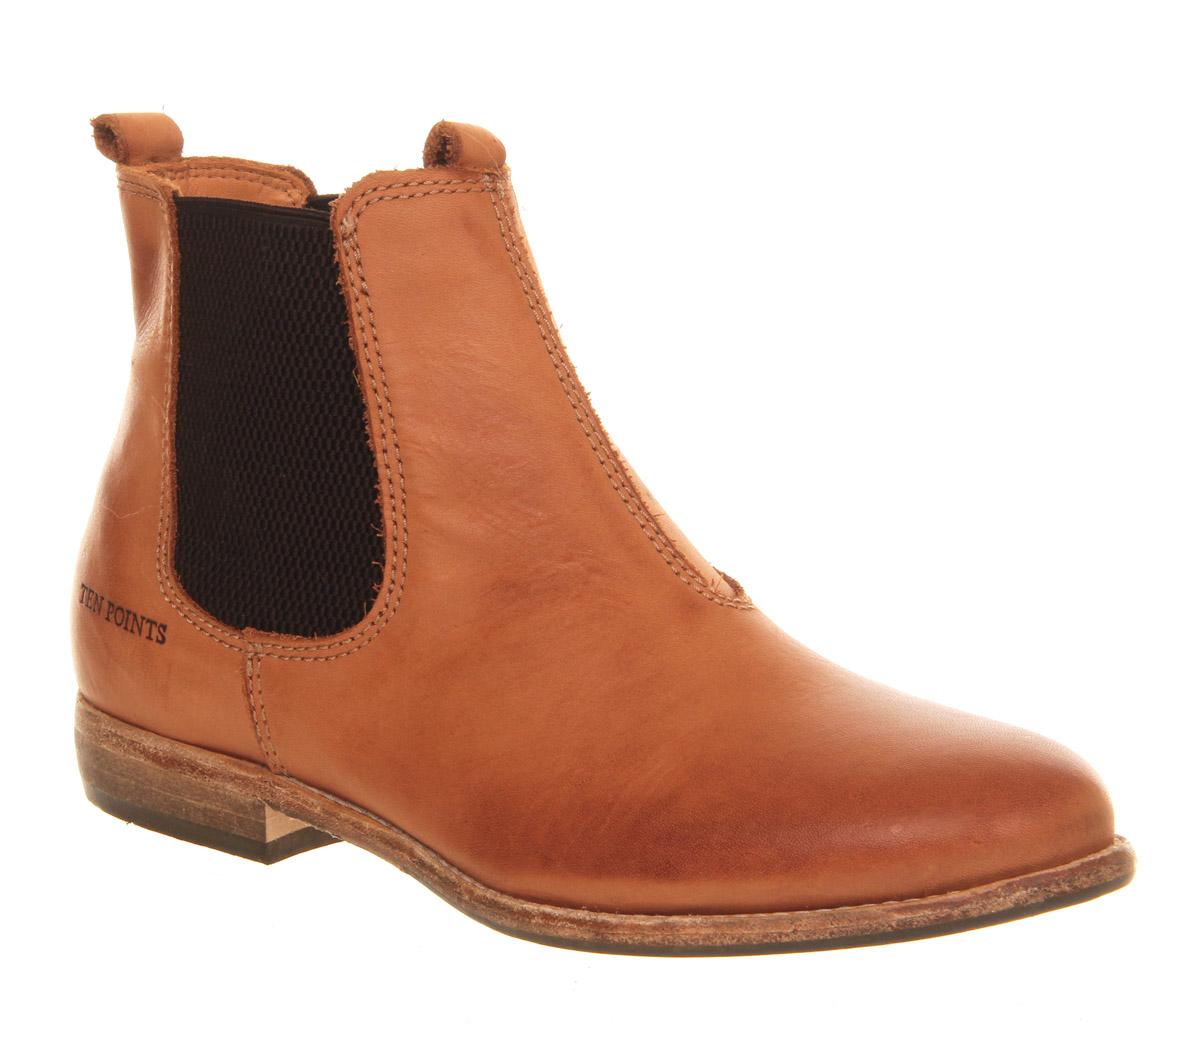 clothes shoes accessories women 39 s shoes boots. Black Bedroom Furniture Sets. Home Design Ideas